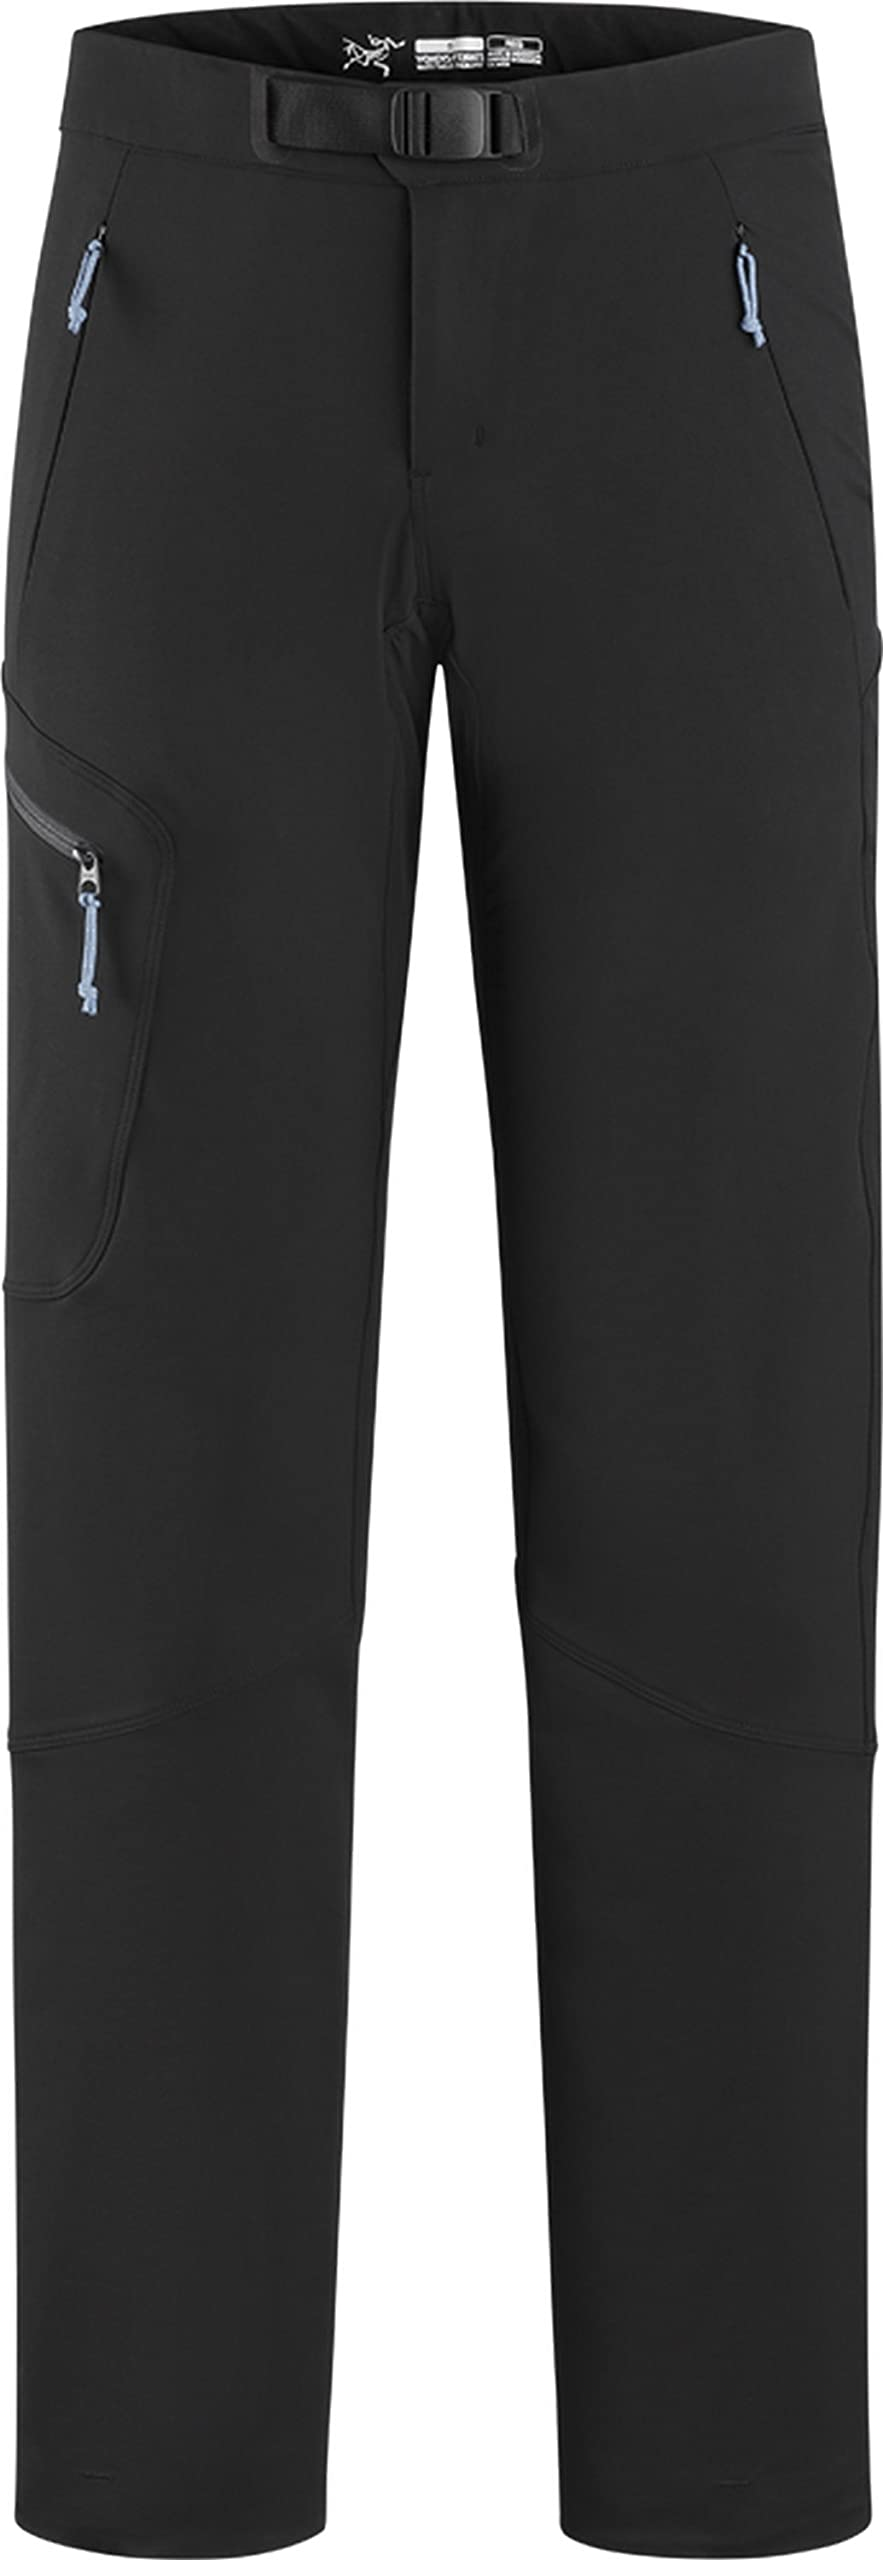 Arc'teryx Damen Gamma AR Pant, Black, 8